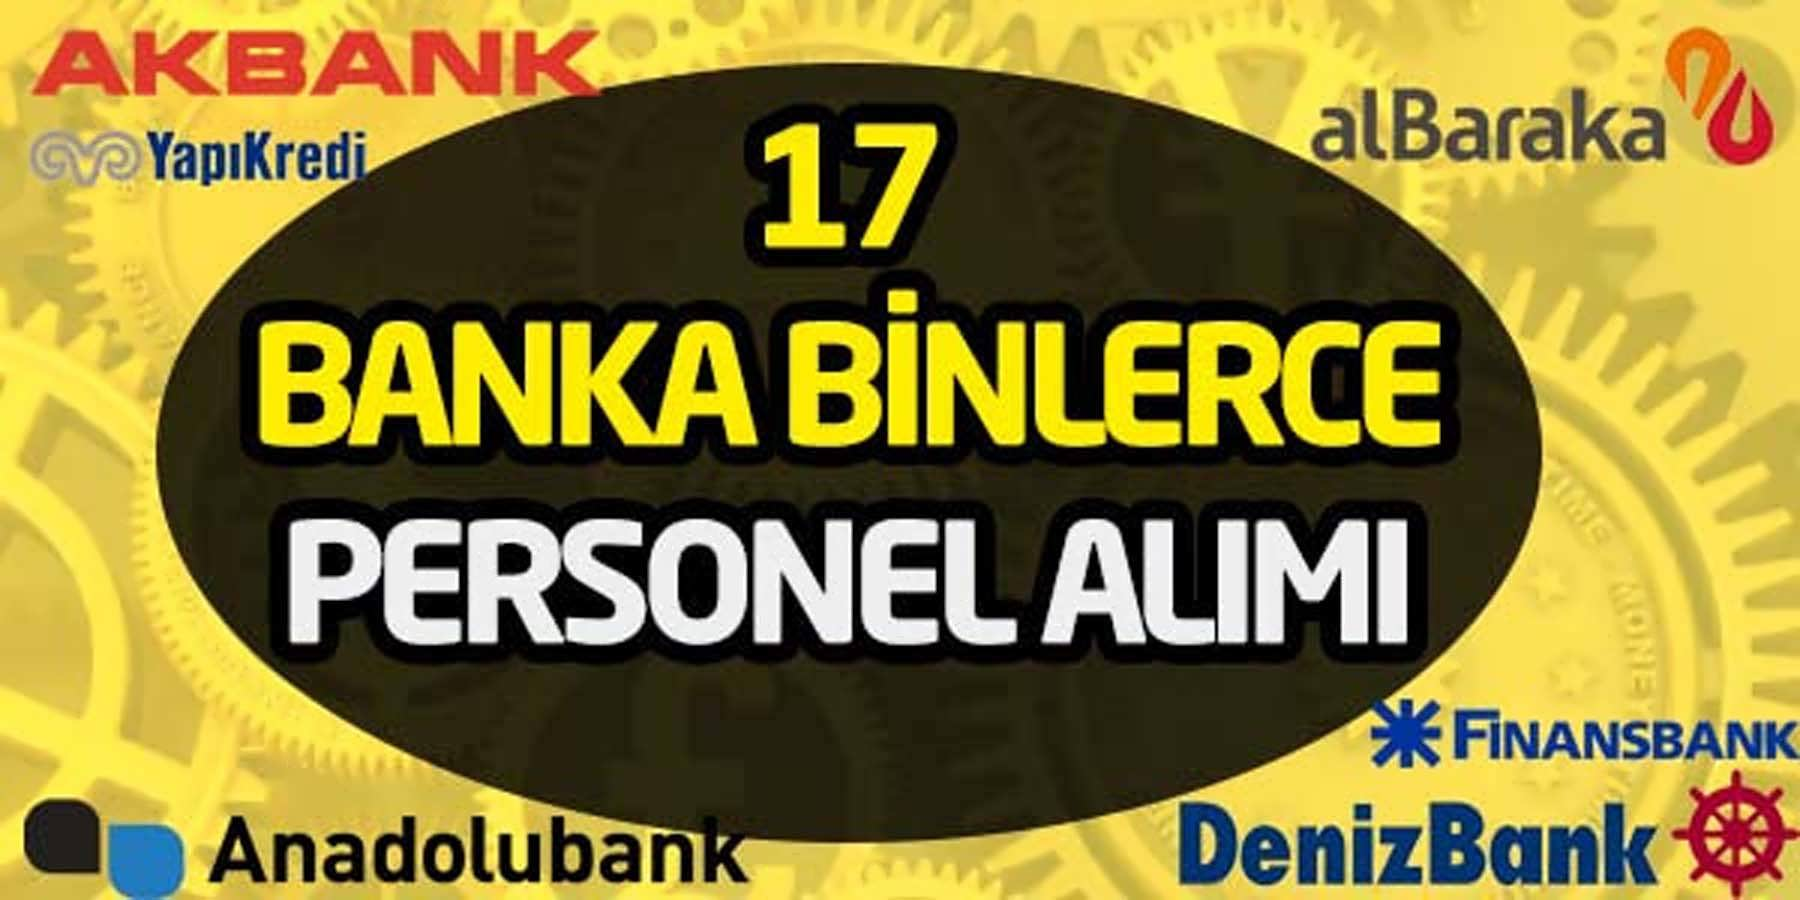 17 Banka Binlerce Personel Alımı